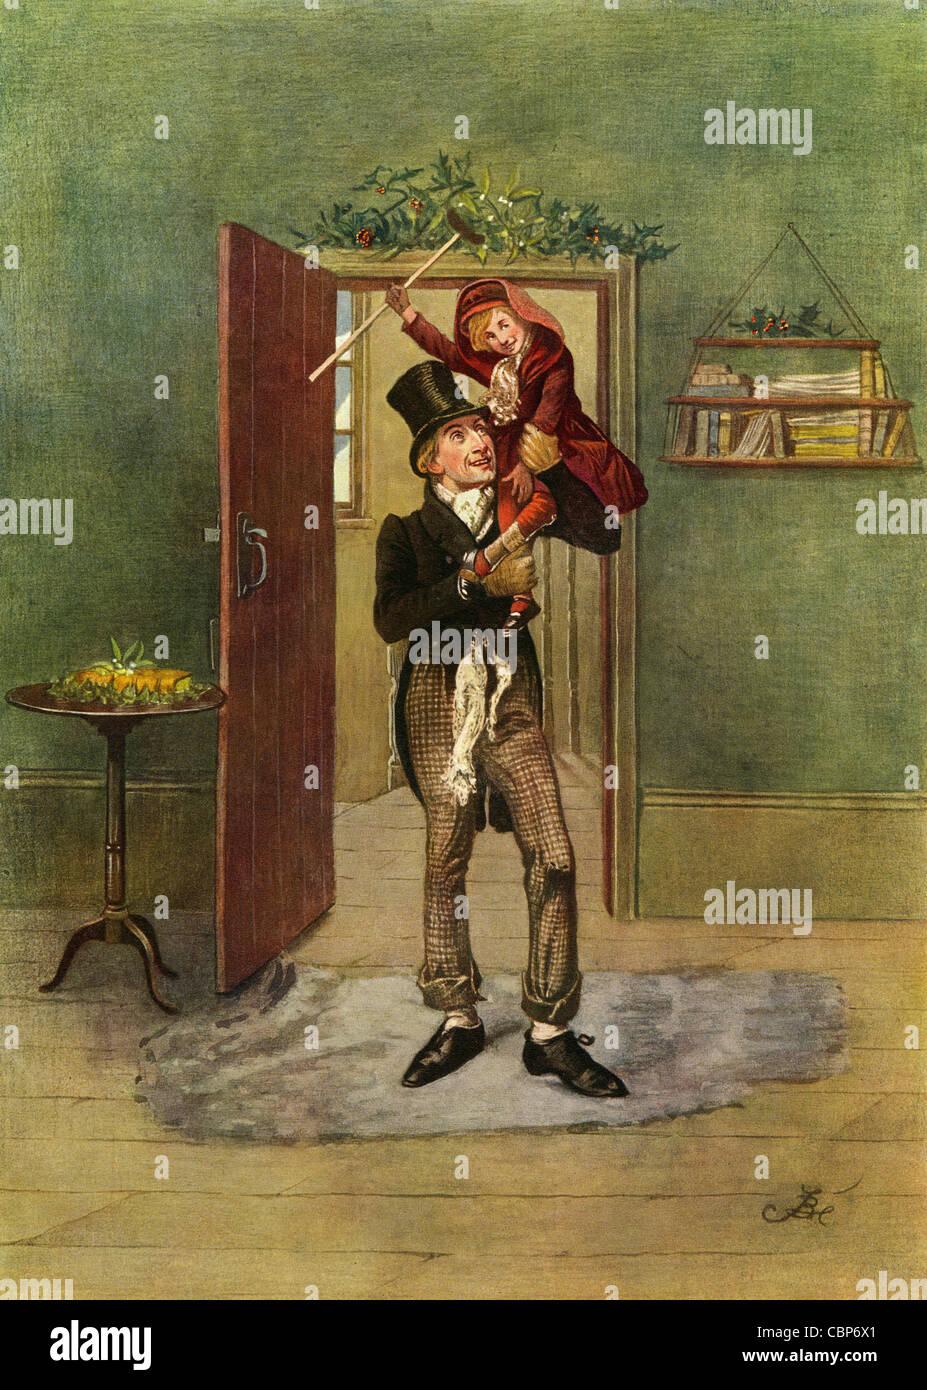 Tiny Tim Christmas Carol.Bob Cratchit And Tiny Tim From A Christmas Carol Stock